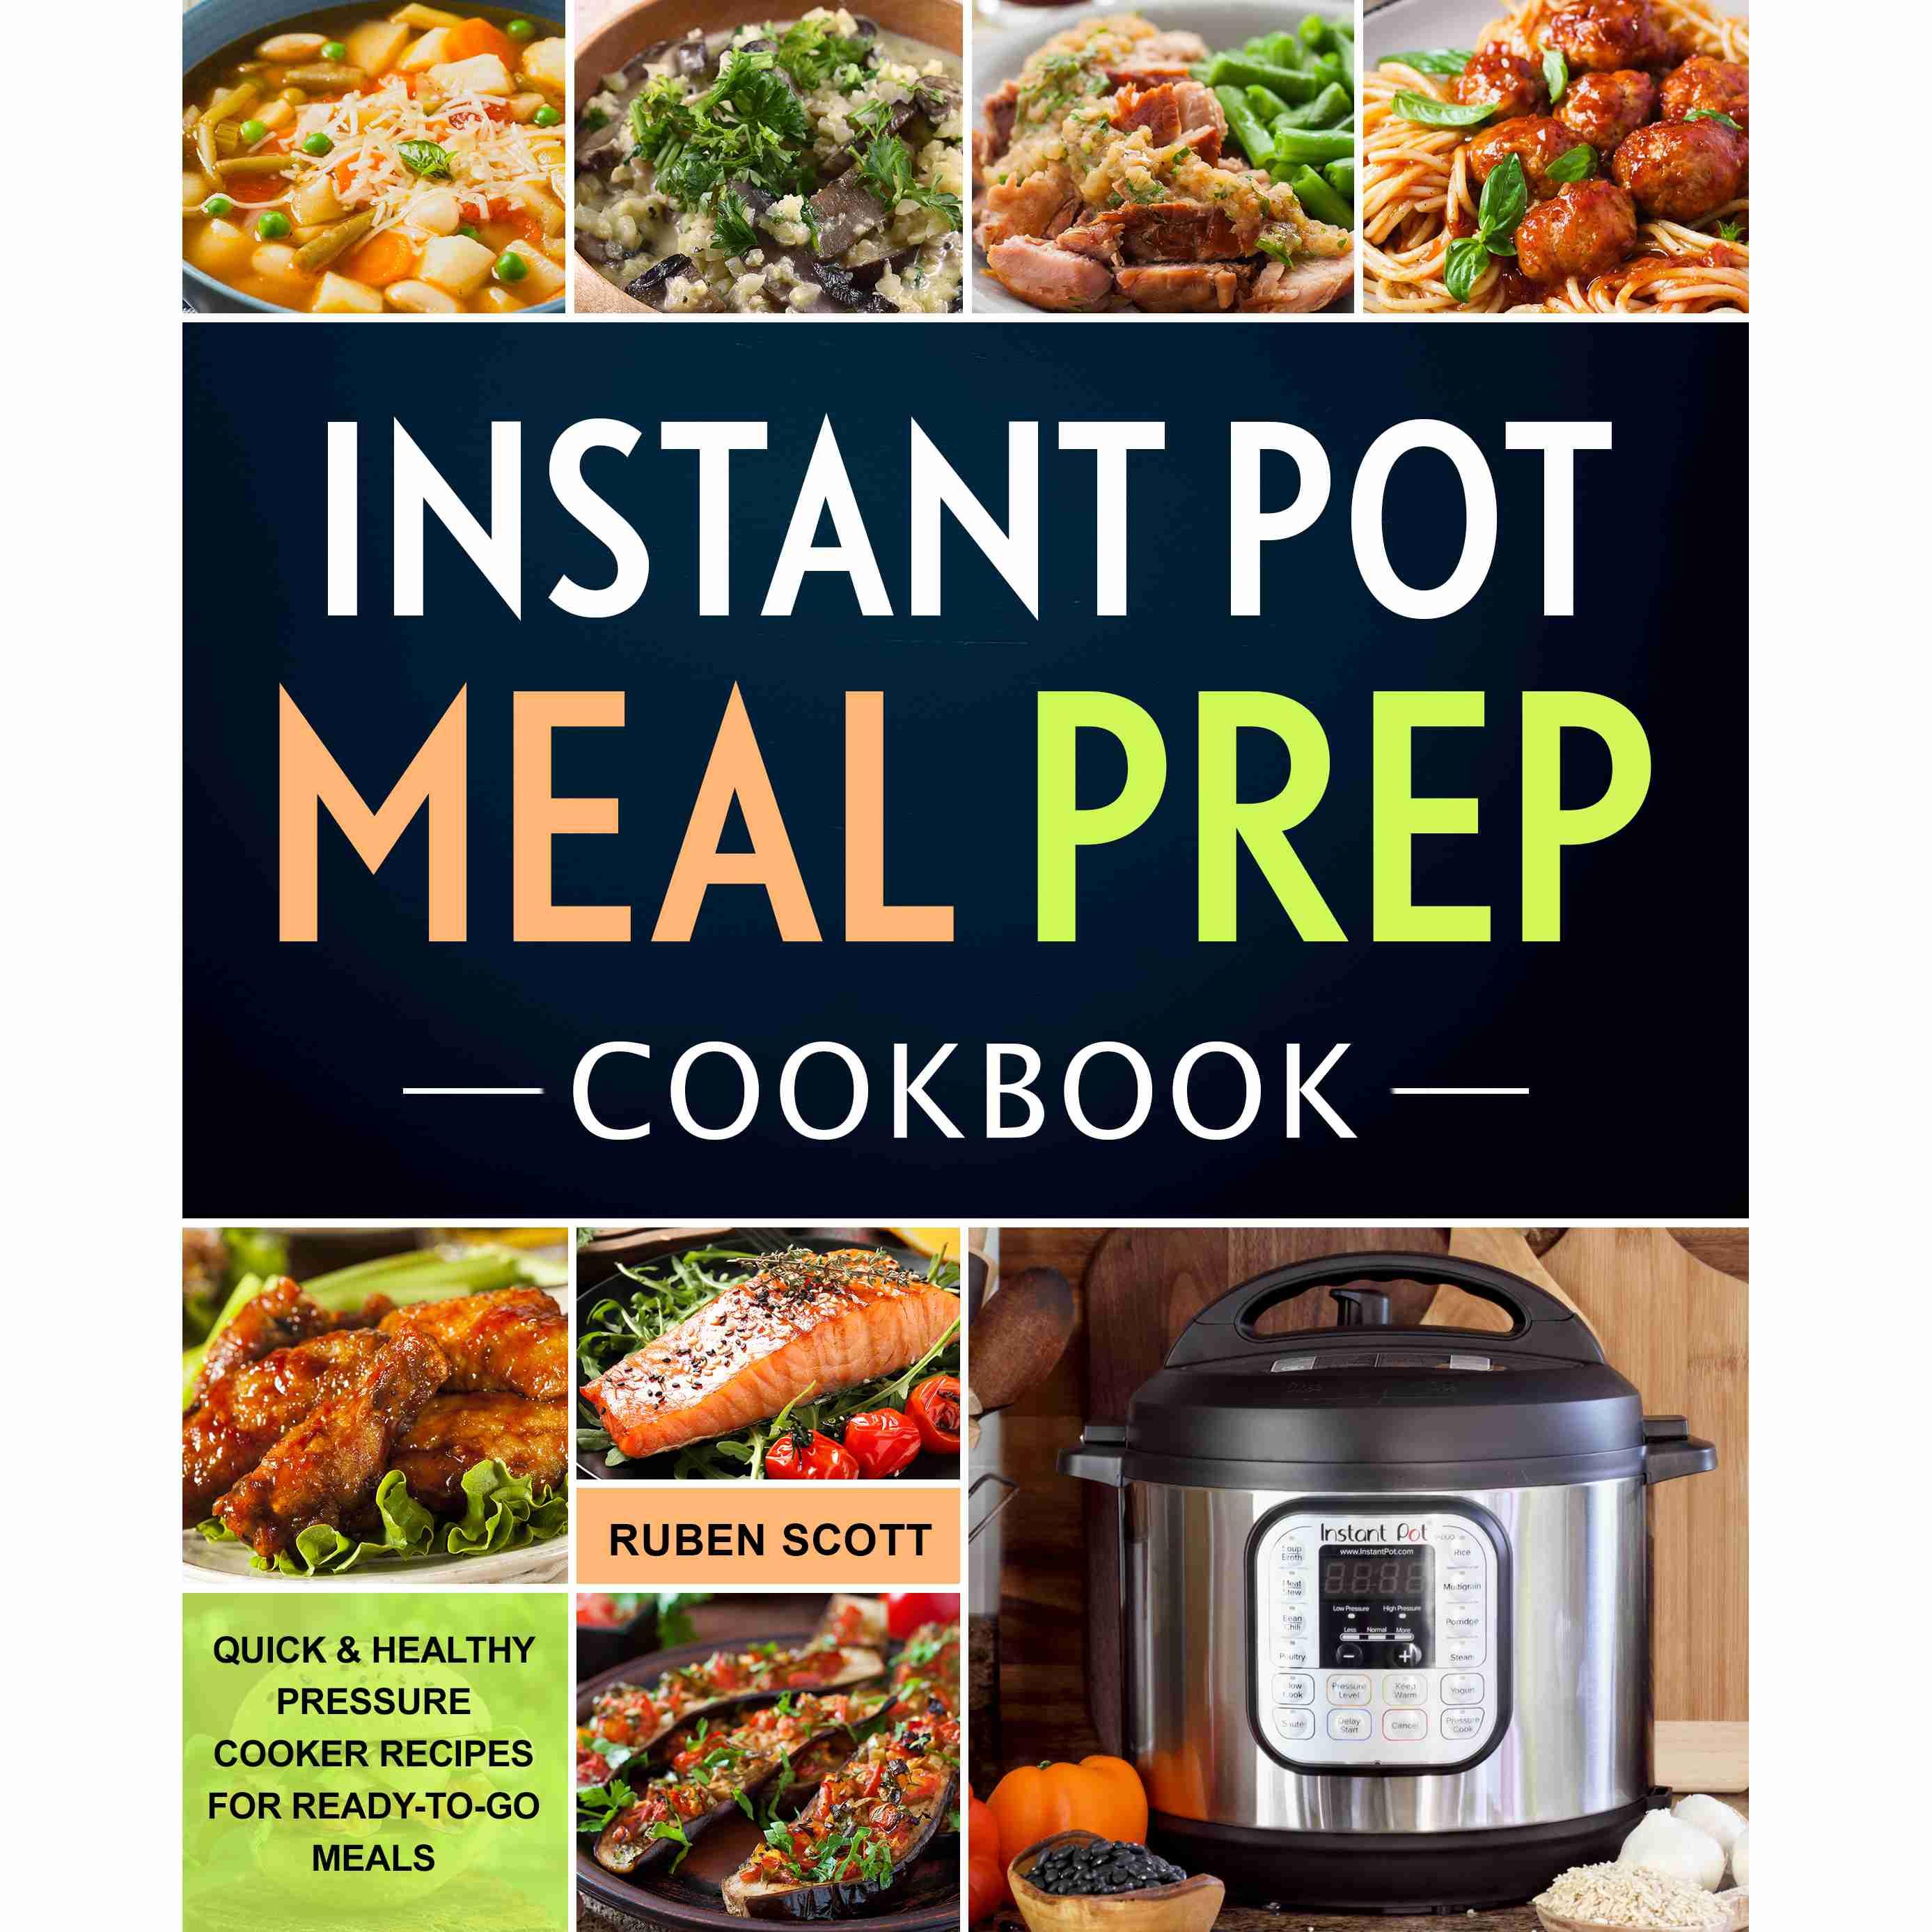 meal-prep-cookbooks with cash back rebate